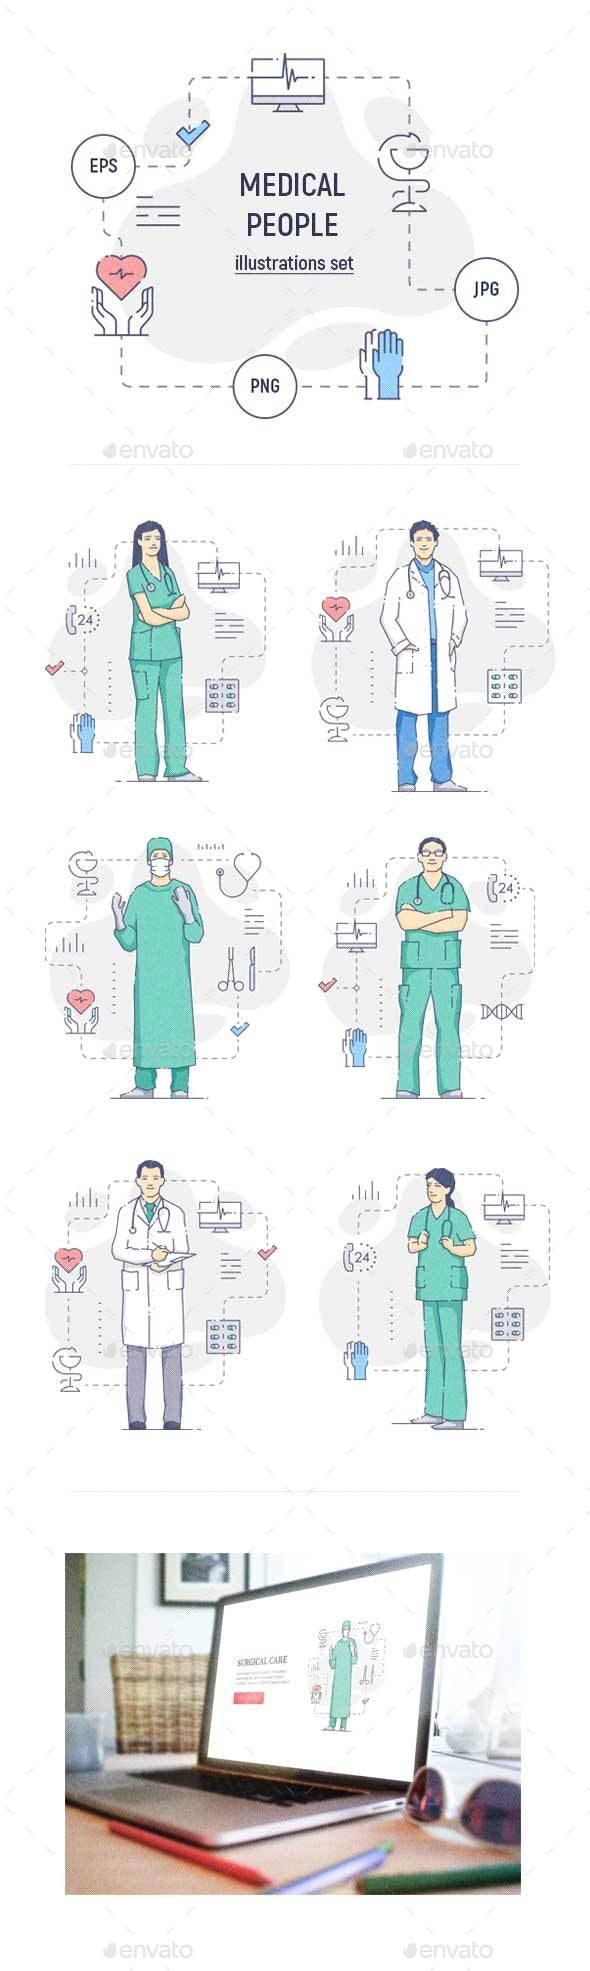 Medical People Illustration Set - People Characters